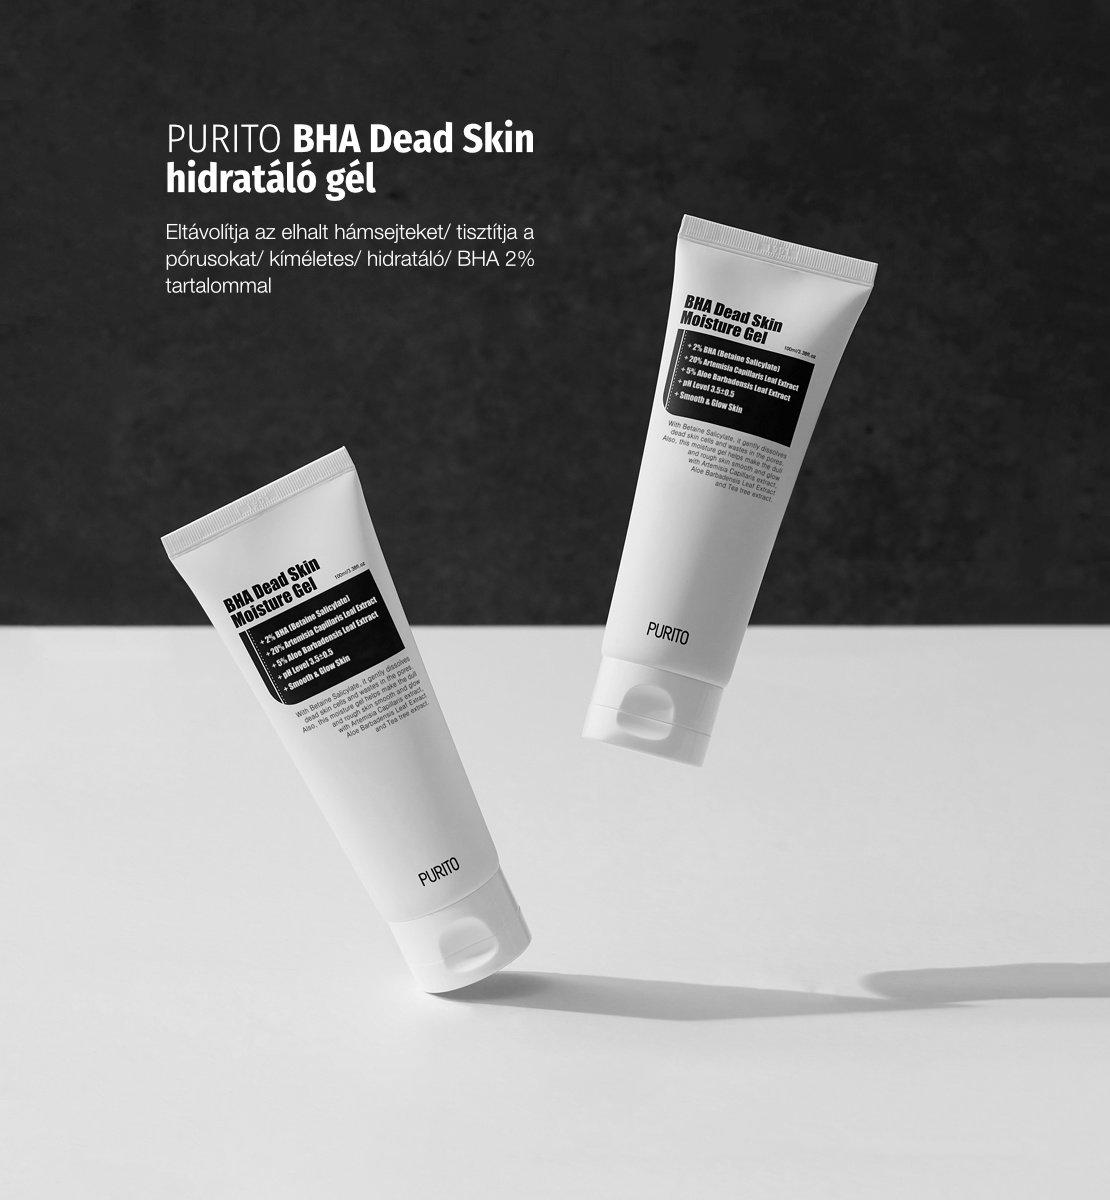 PURITO BHA Dead Skin hidratáló gél